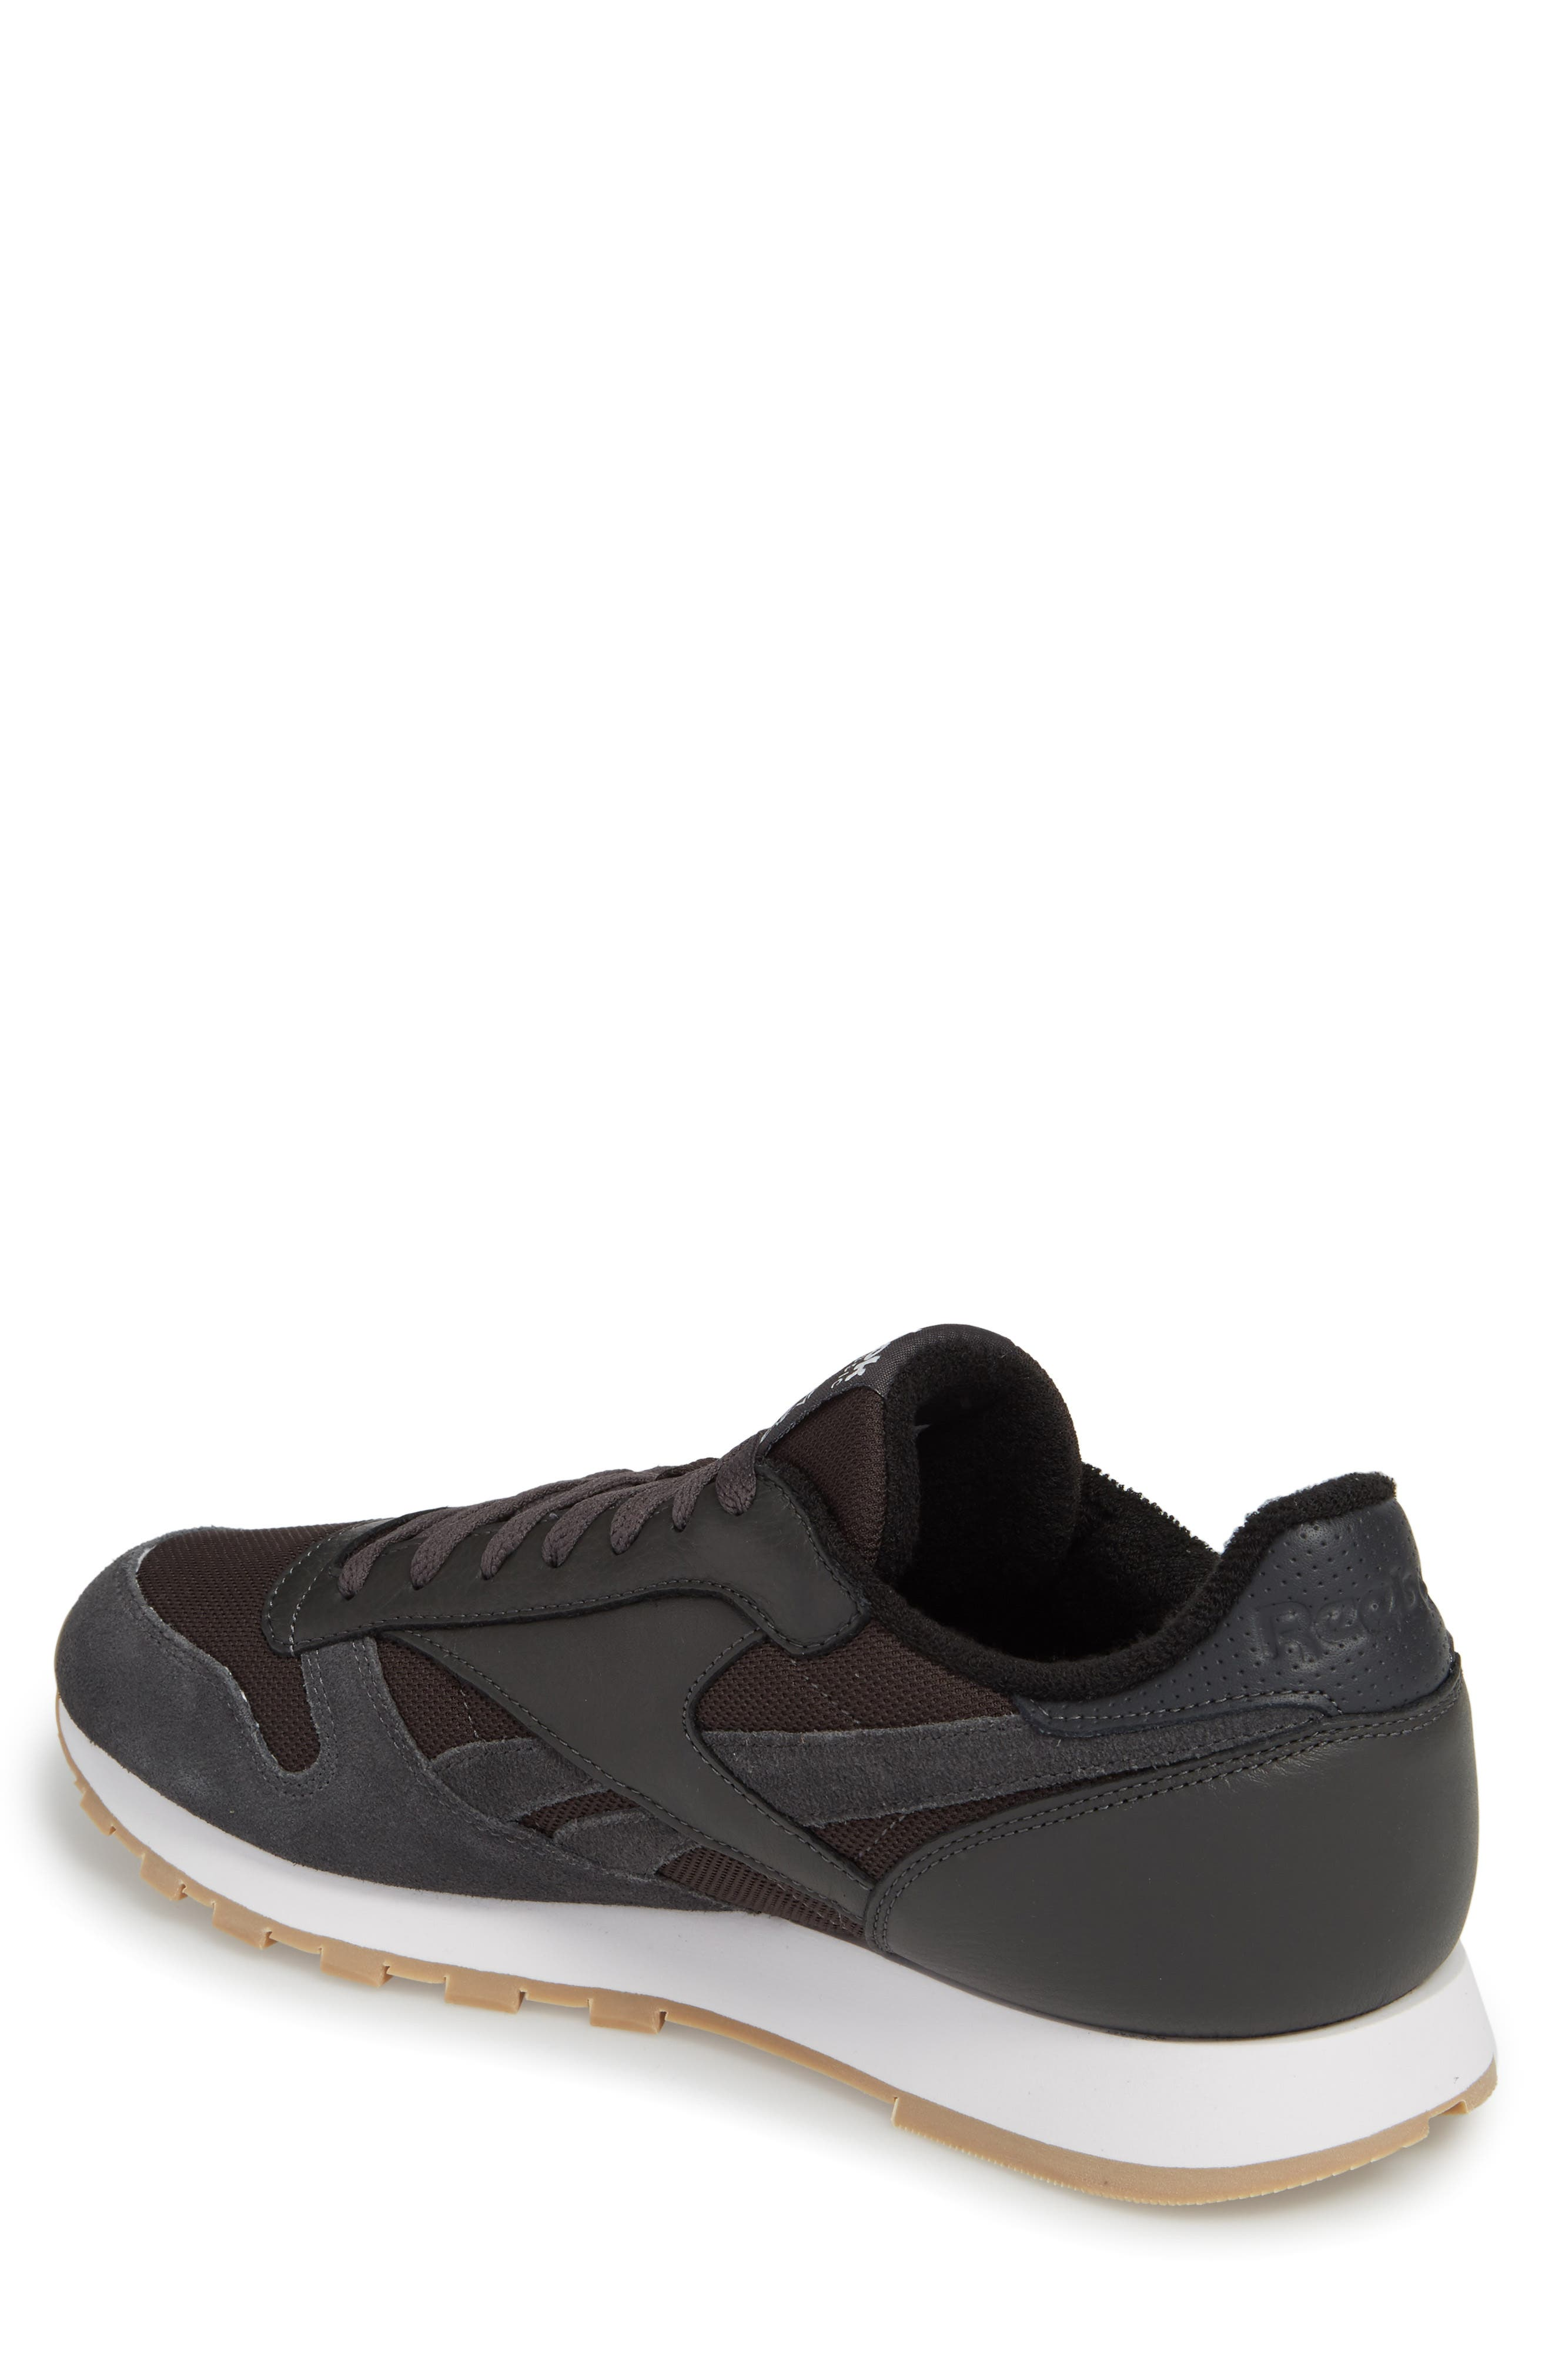 ESTL Classic Leather Sneaker,                             Alternate thumbnail 2, color,                             001